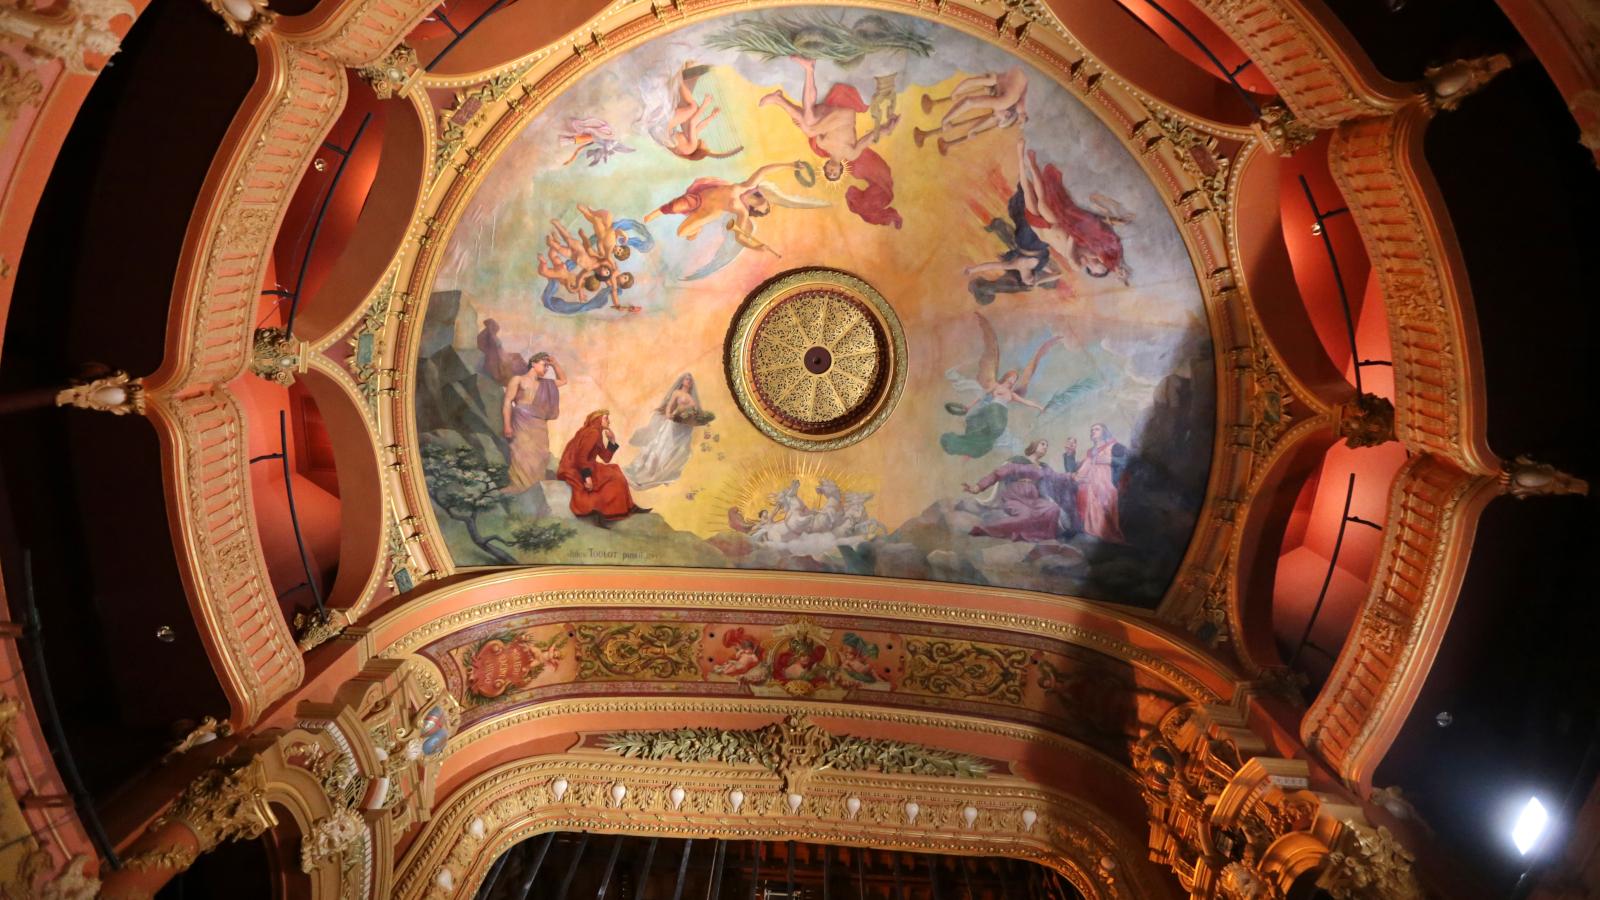 © Plafond de l'Opéra